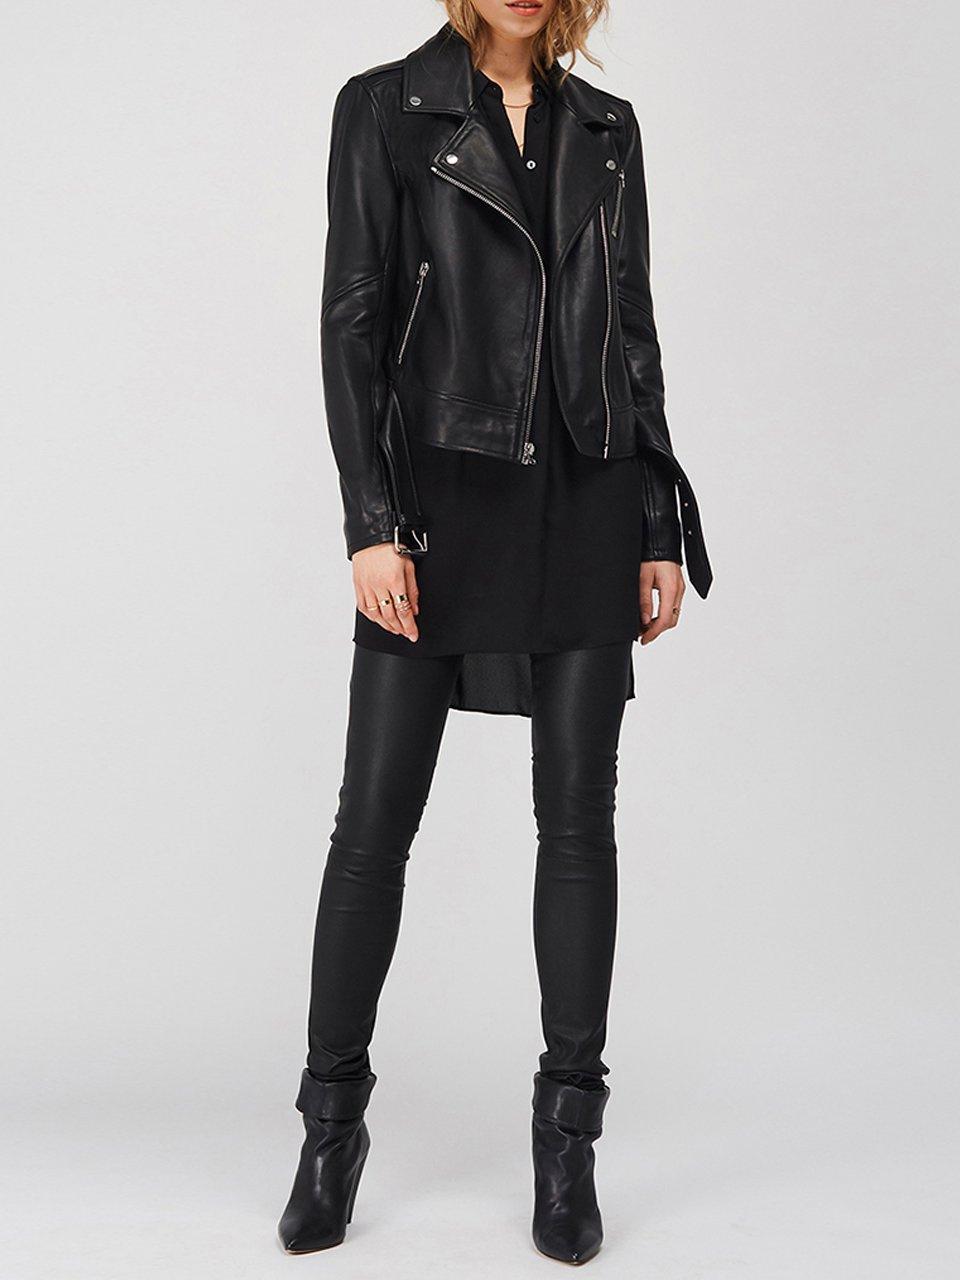 Legend leather jacket - Dante6